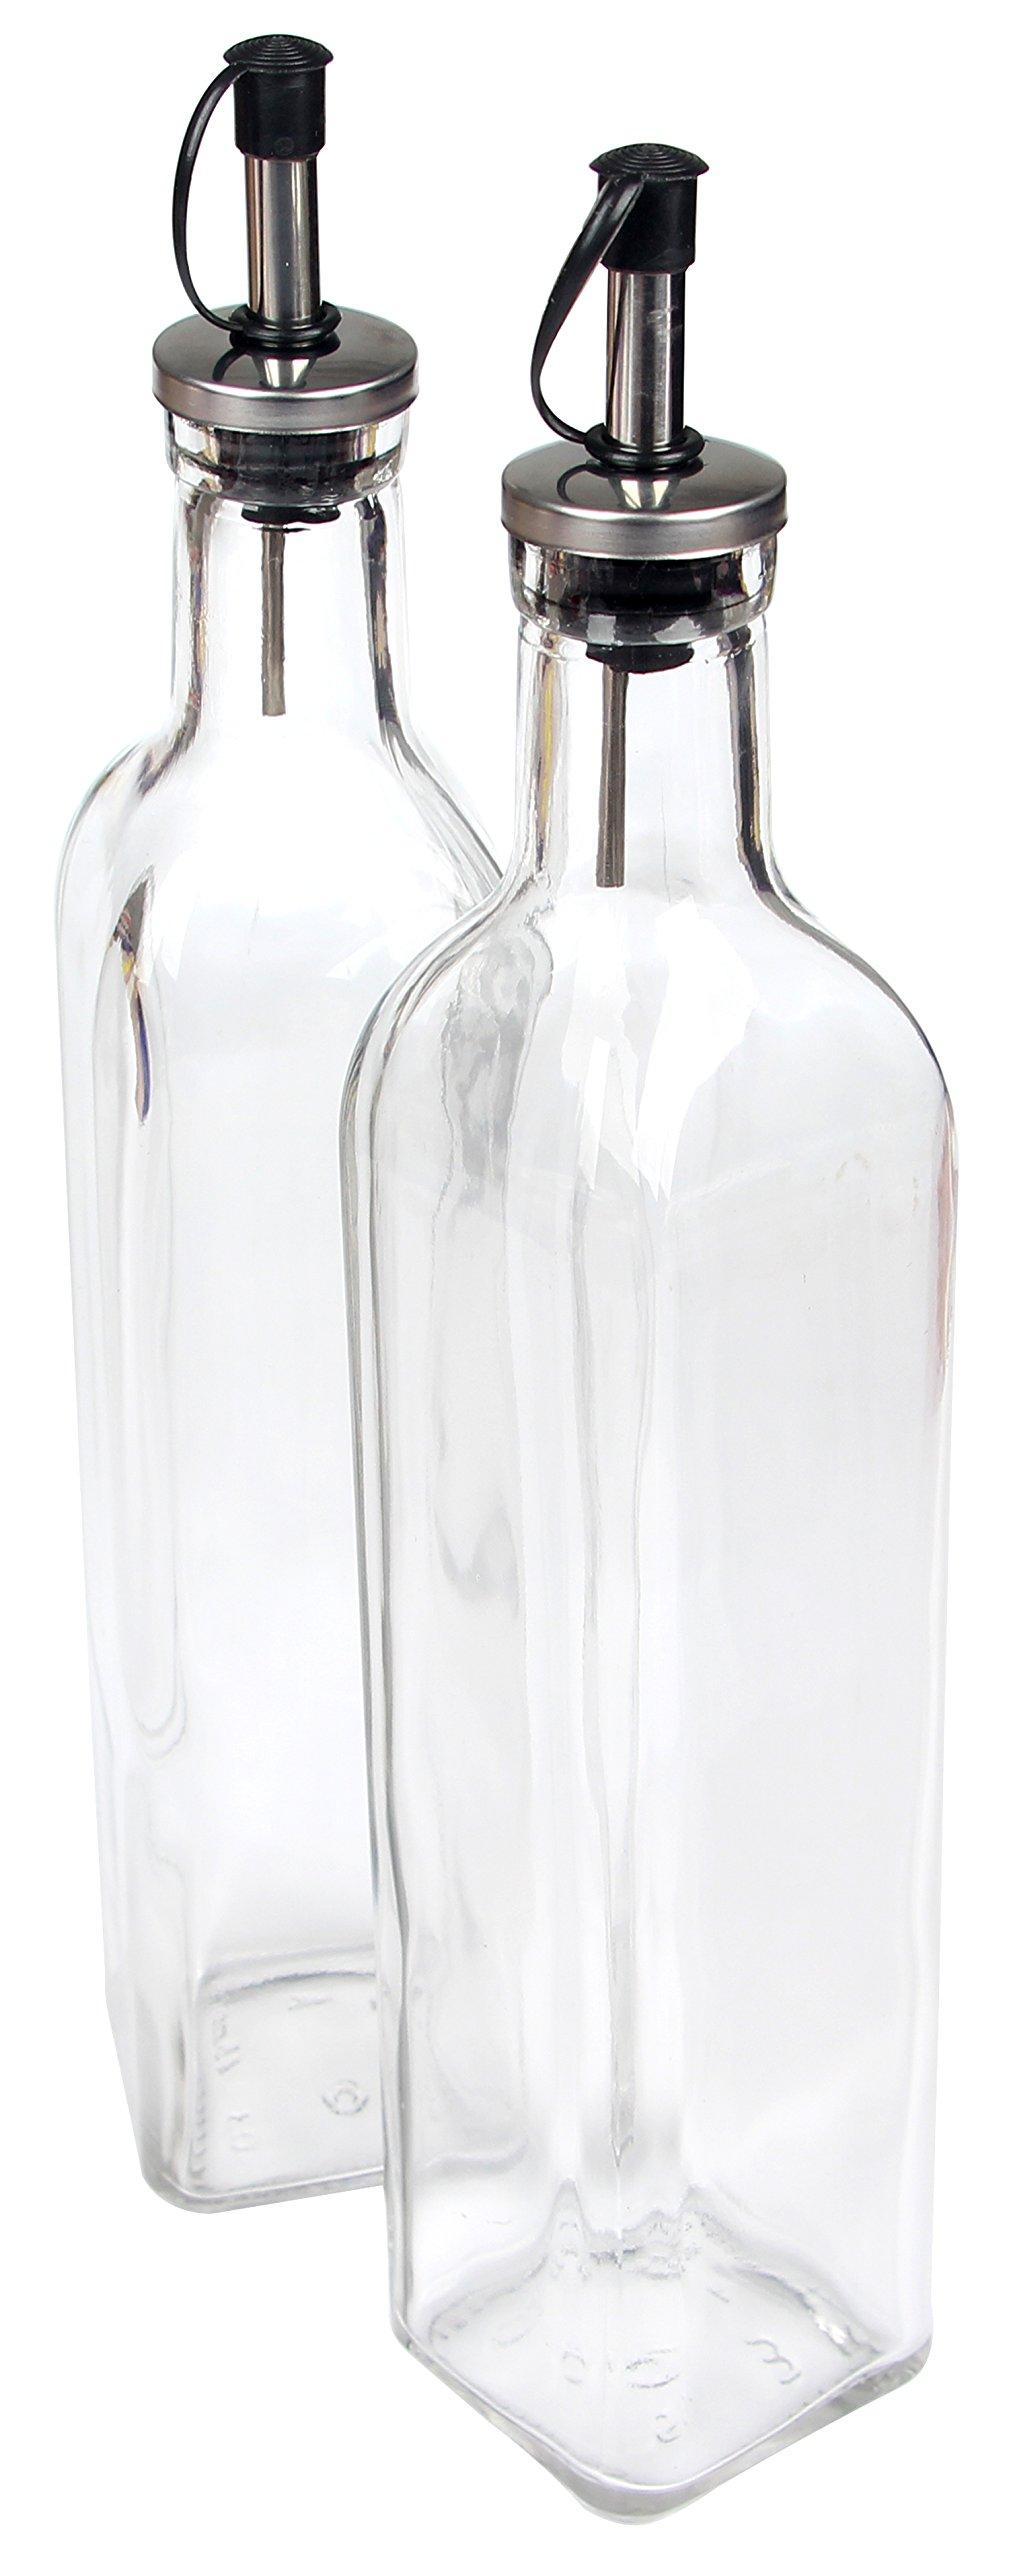 Hierkryst Container Spout Oil Dispenser Bottle Set for Kitchen Cruet Oil Dispenser Glass Bottle for Cooking,With Lever Release Pourer,17oz,pack of 2